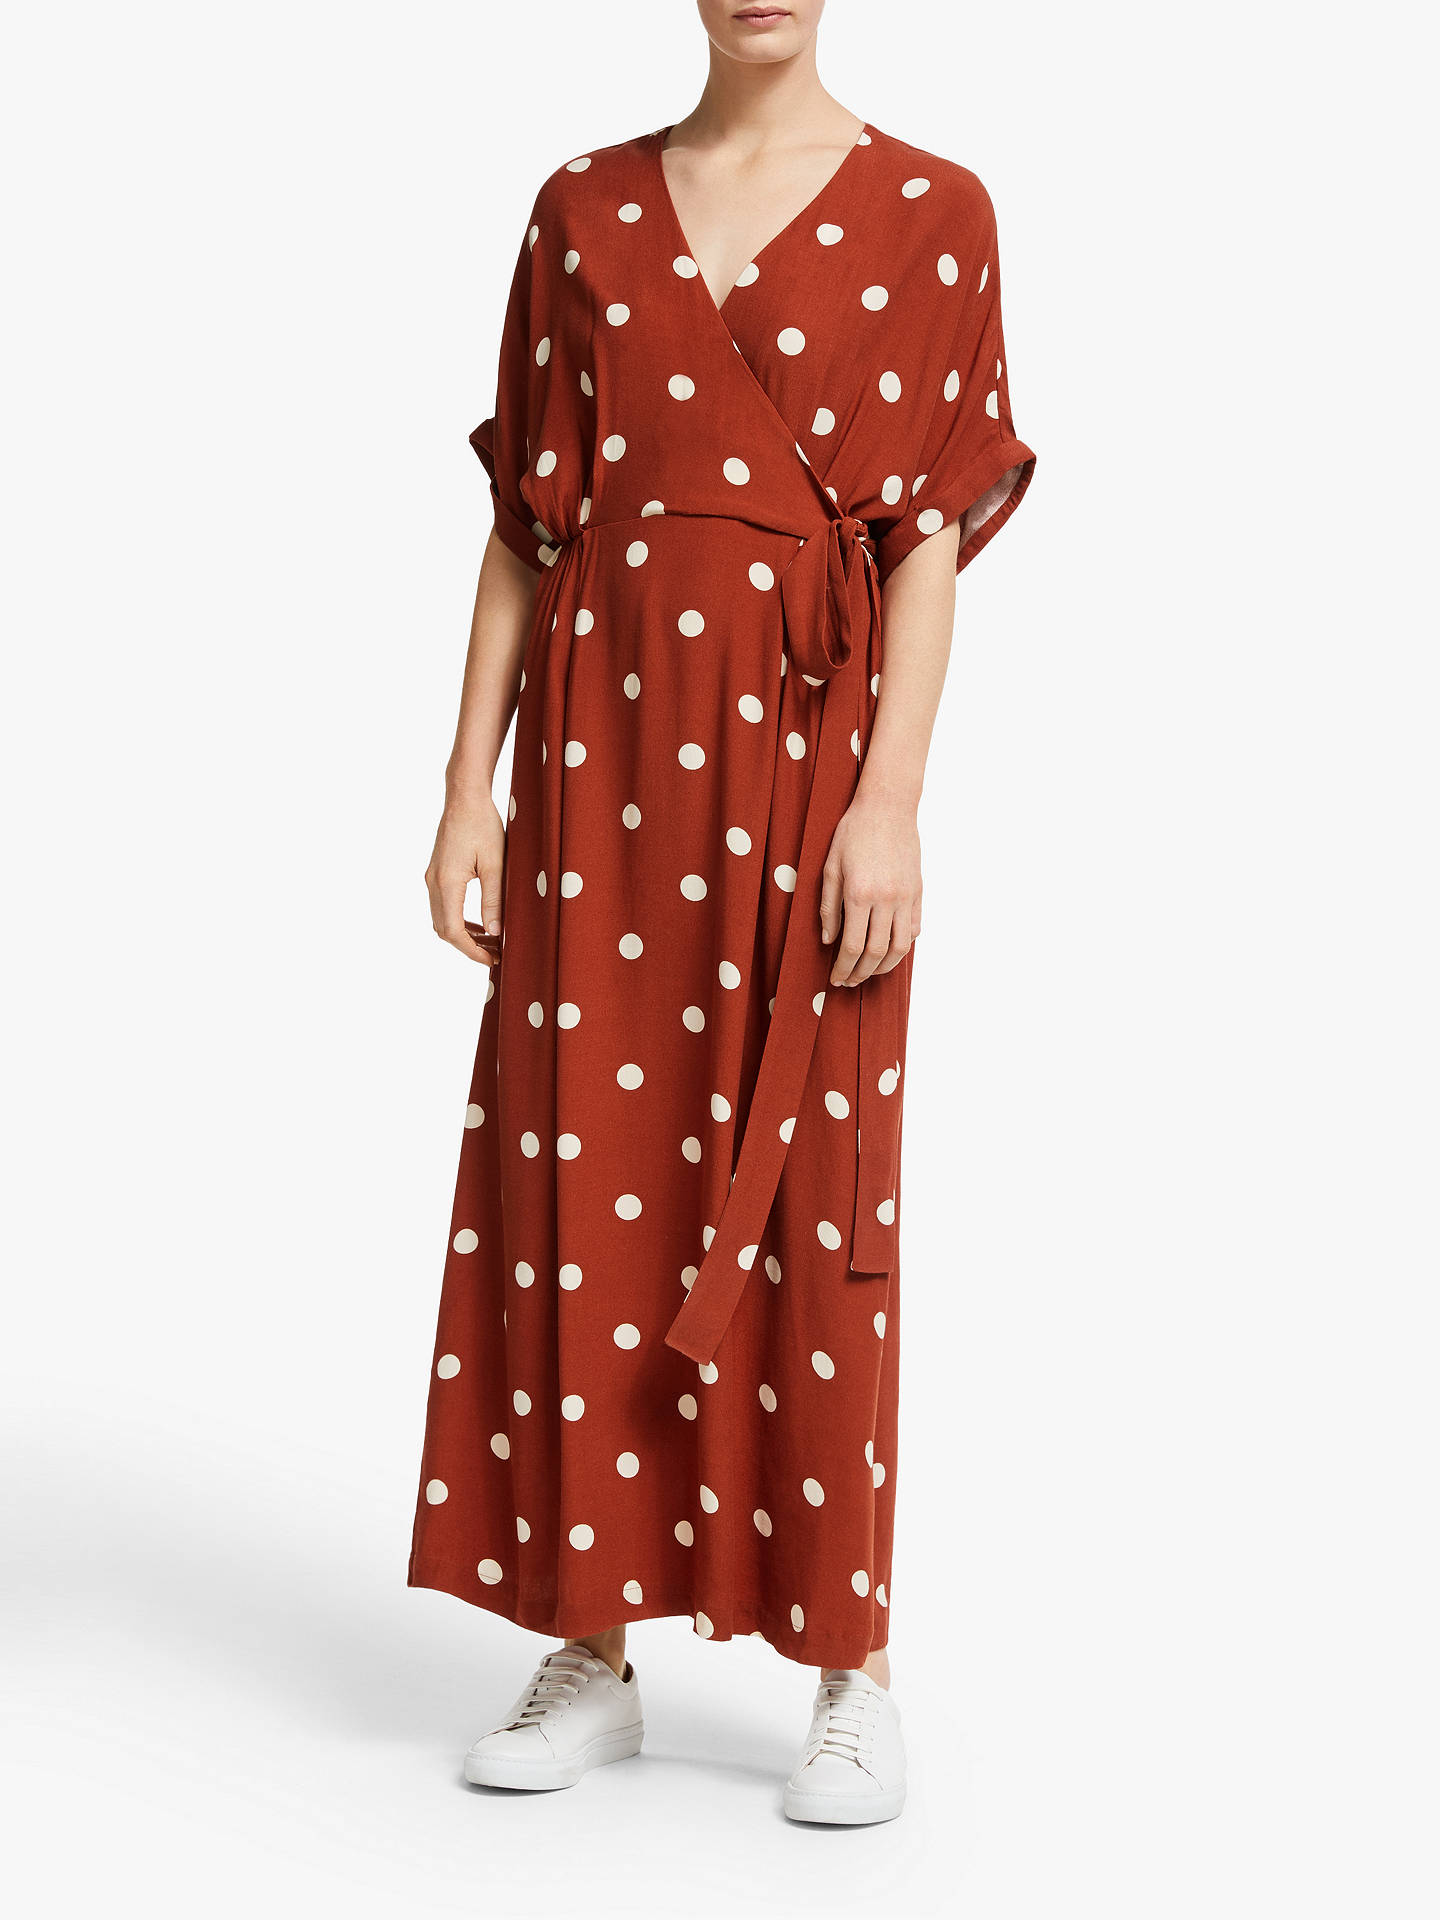 de1908ccc1ea5 Just Female Caia Dress, Barn Red